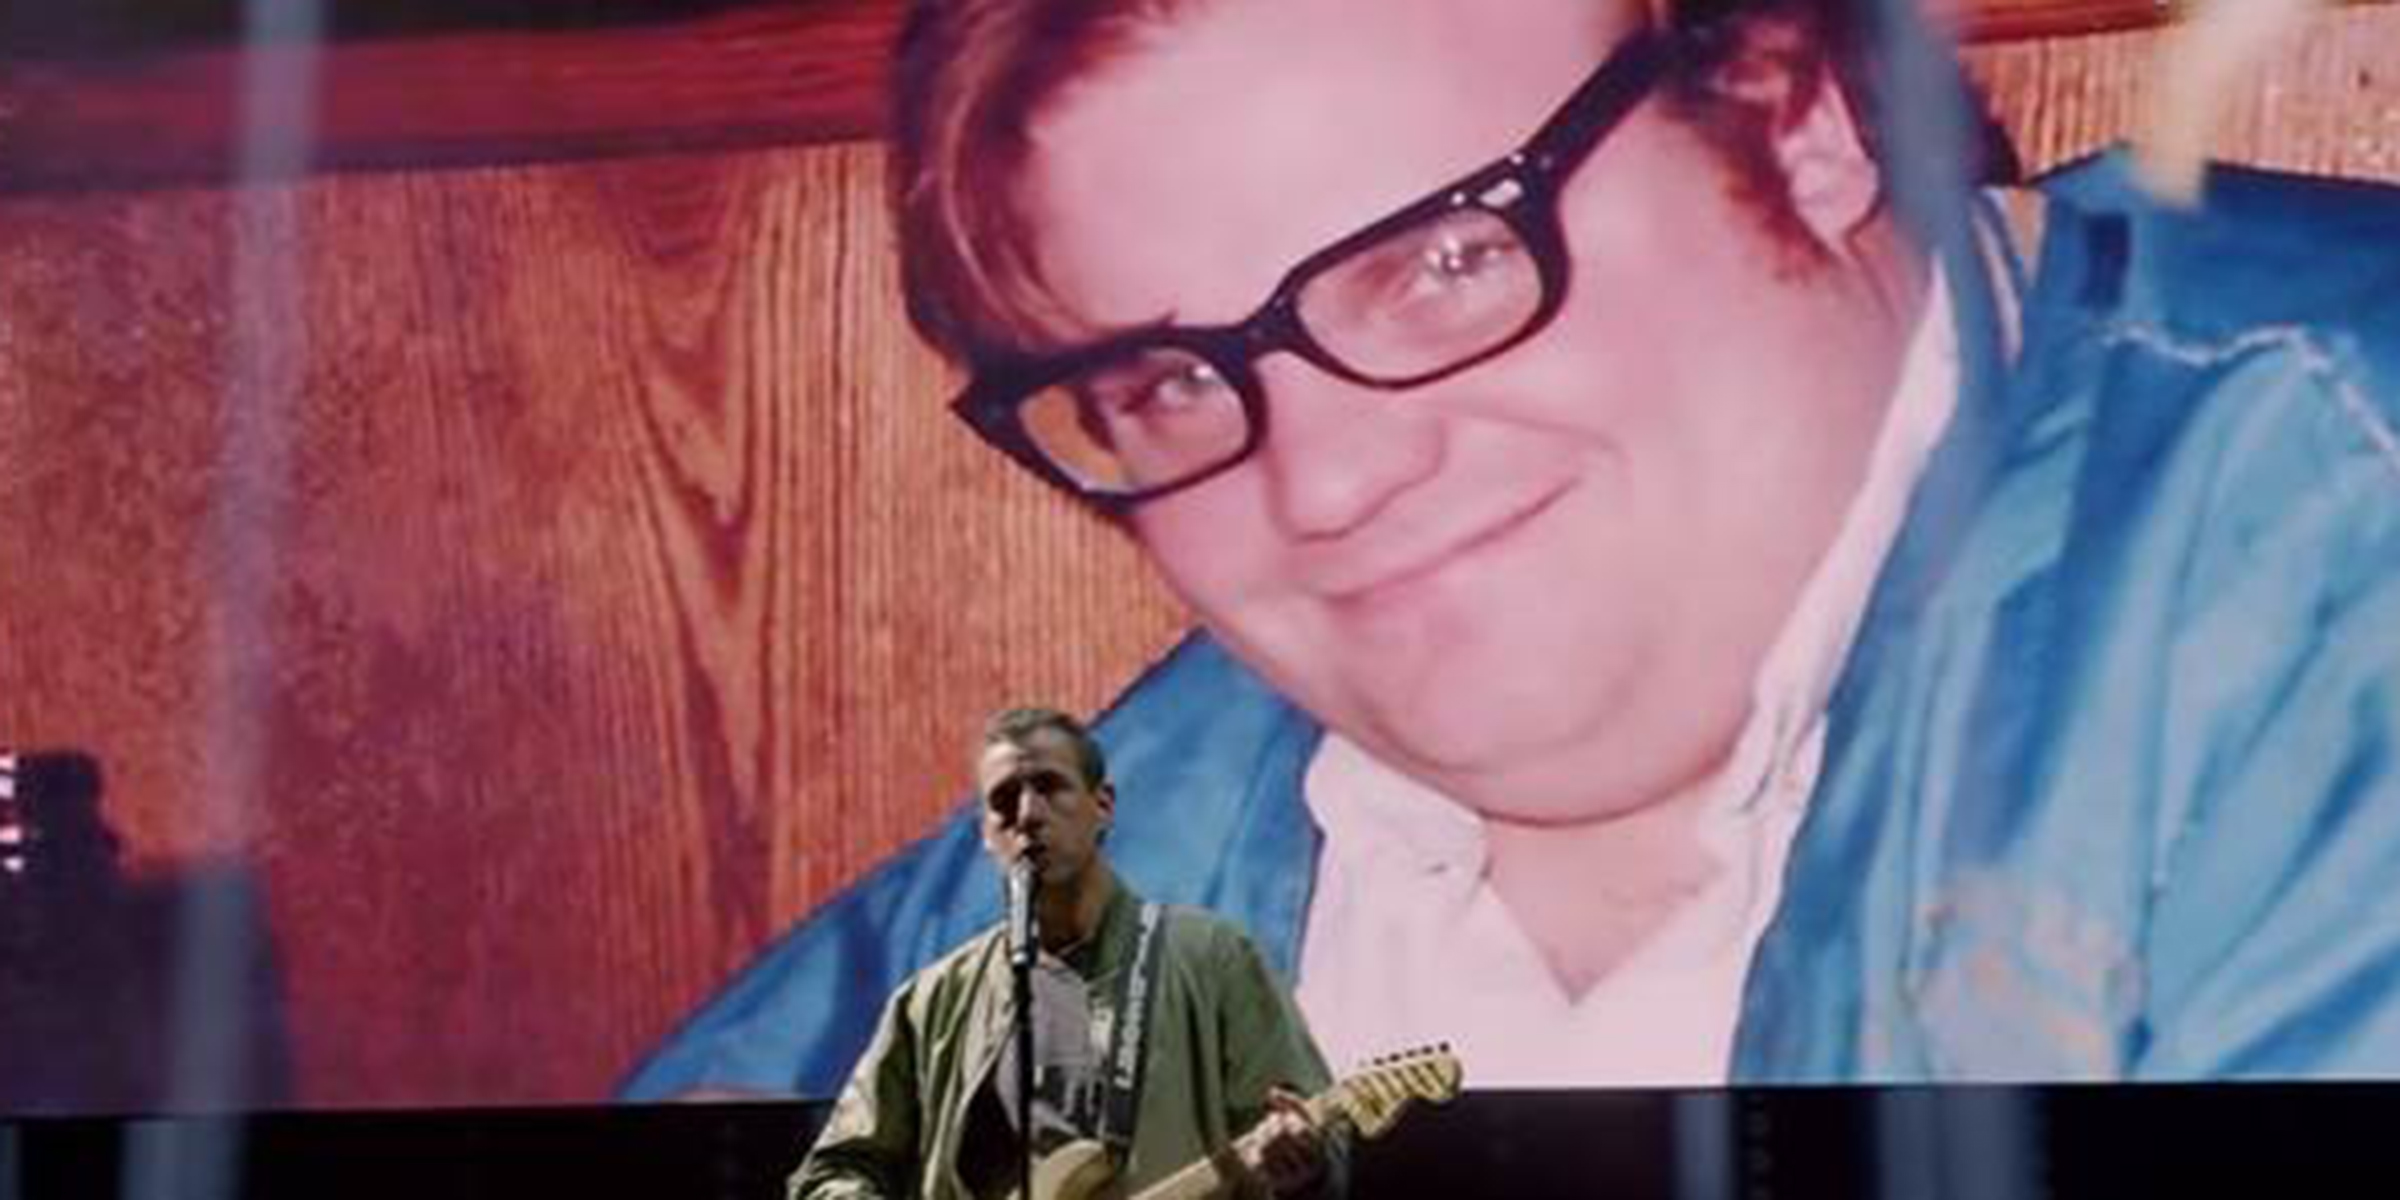 Adam Sandler shares song remembering Chris Farley